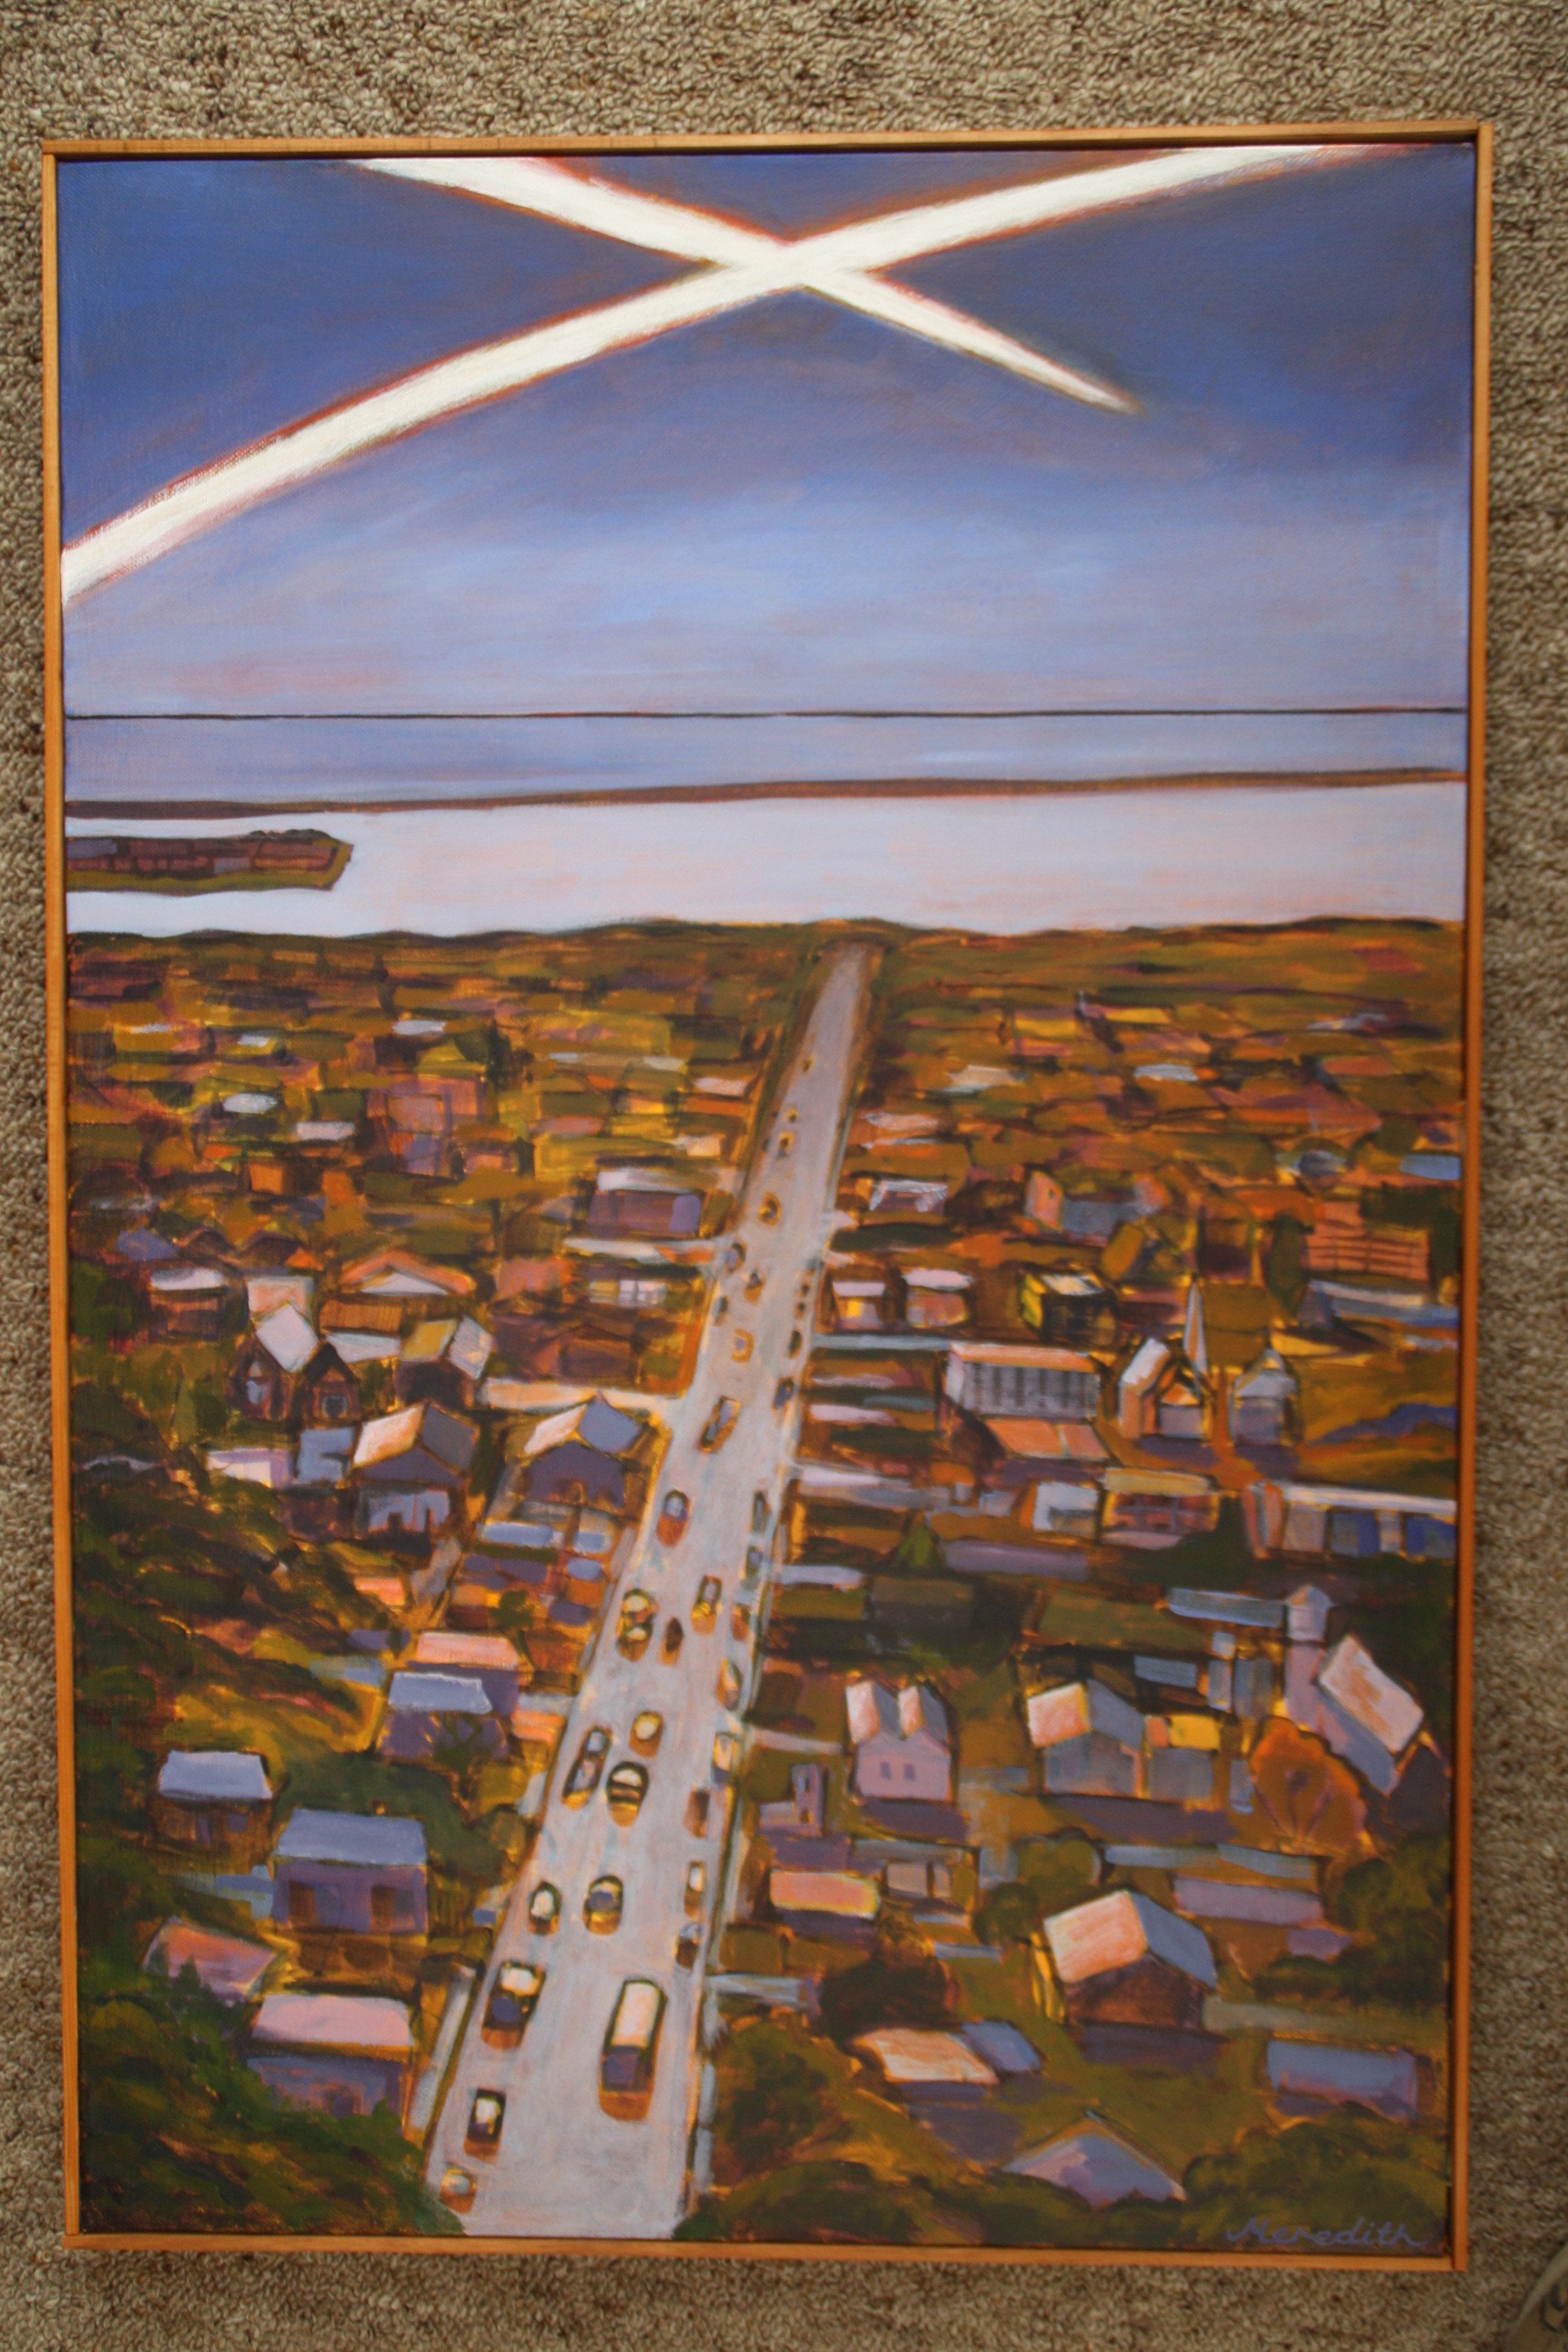 Collingwood St, Nelson  (2014). Acrylic on canvas